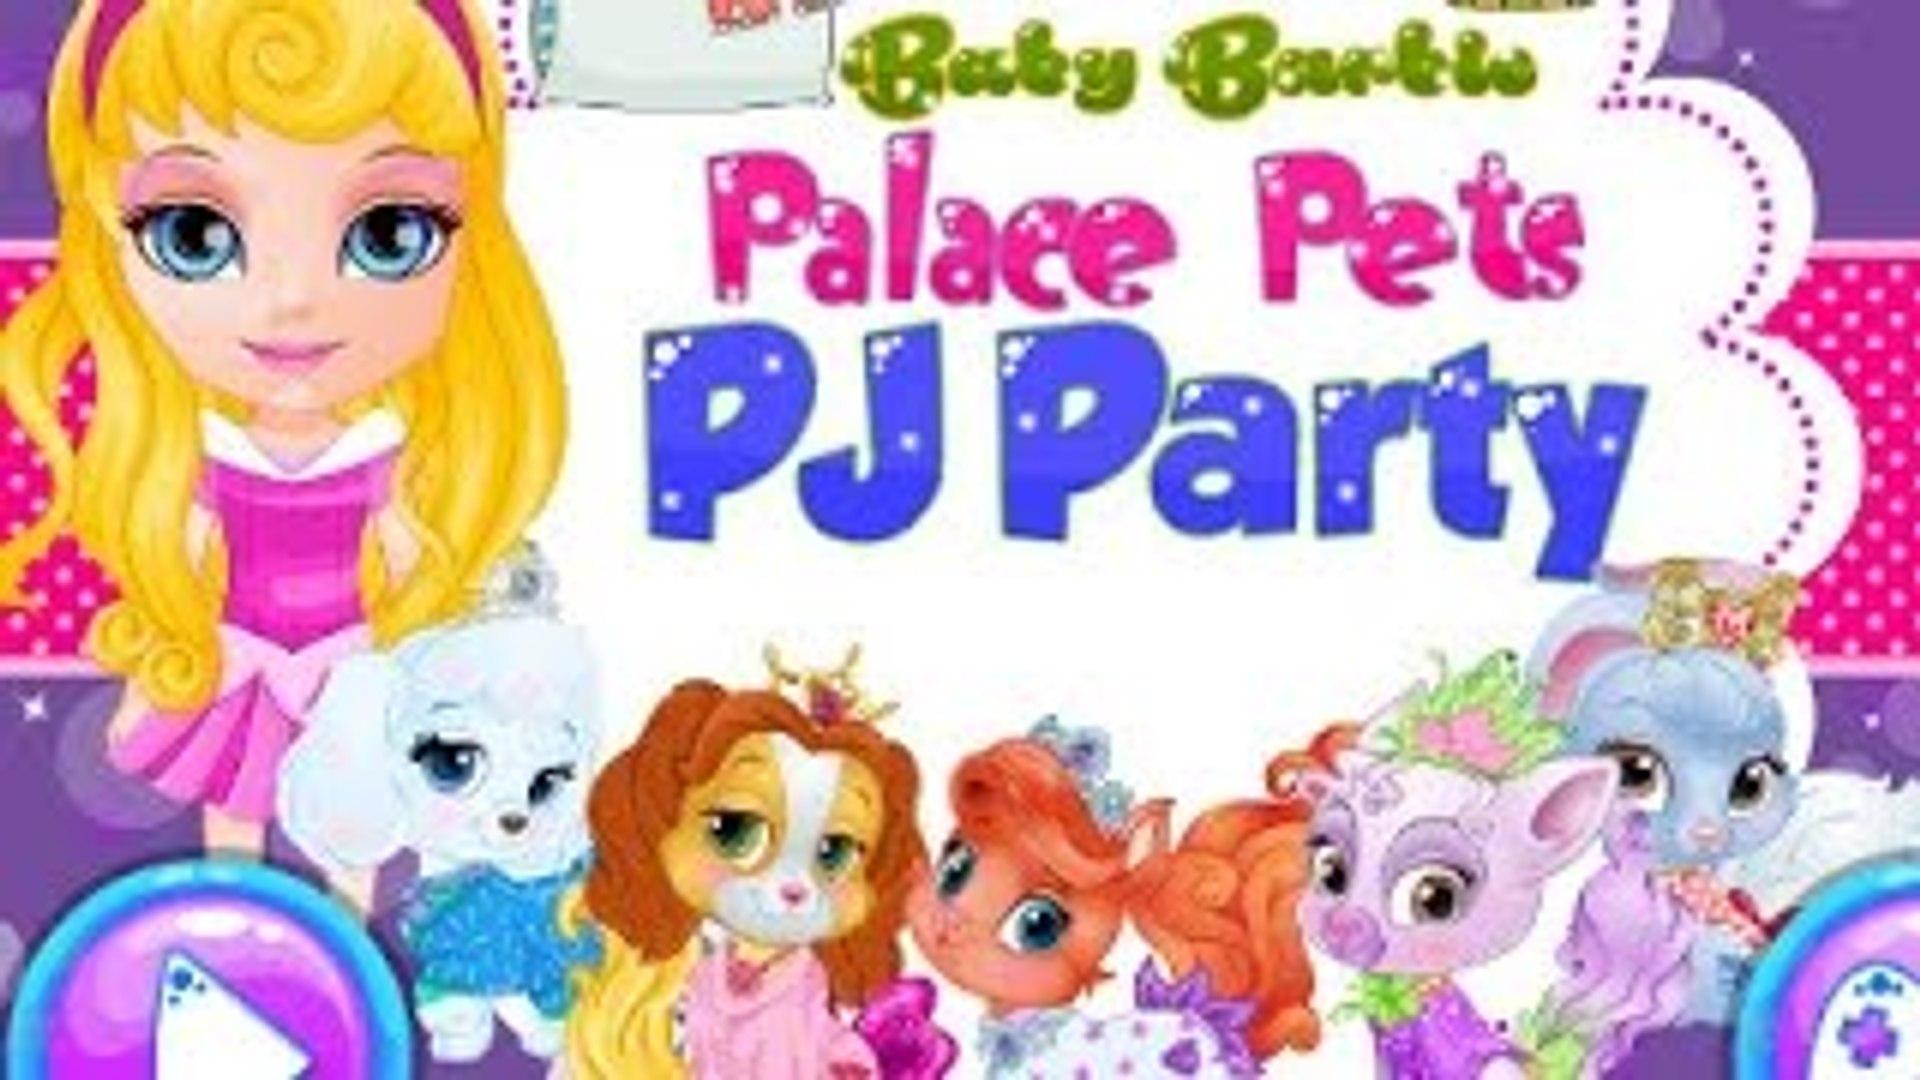 Baby Barbie Game - Baby Barbie Goes To Disneyland - Baby Barbie Palace Pets PJ Party